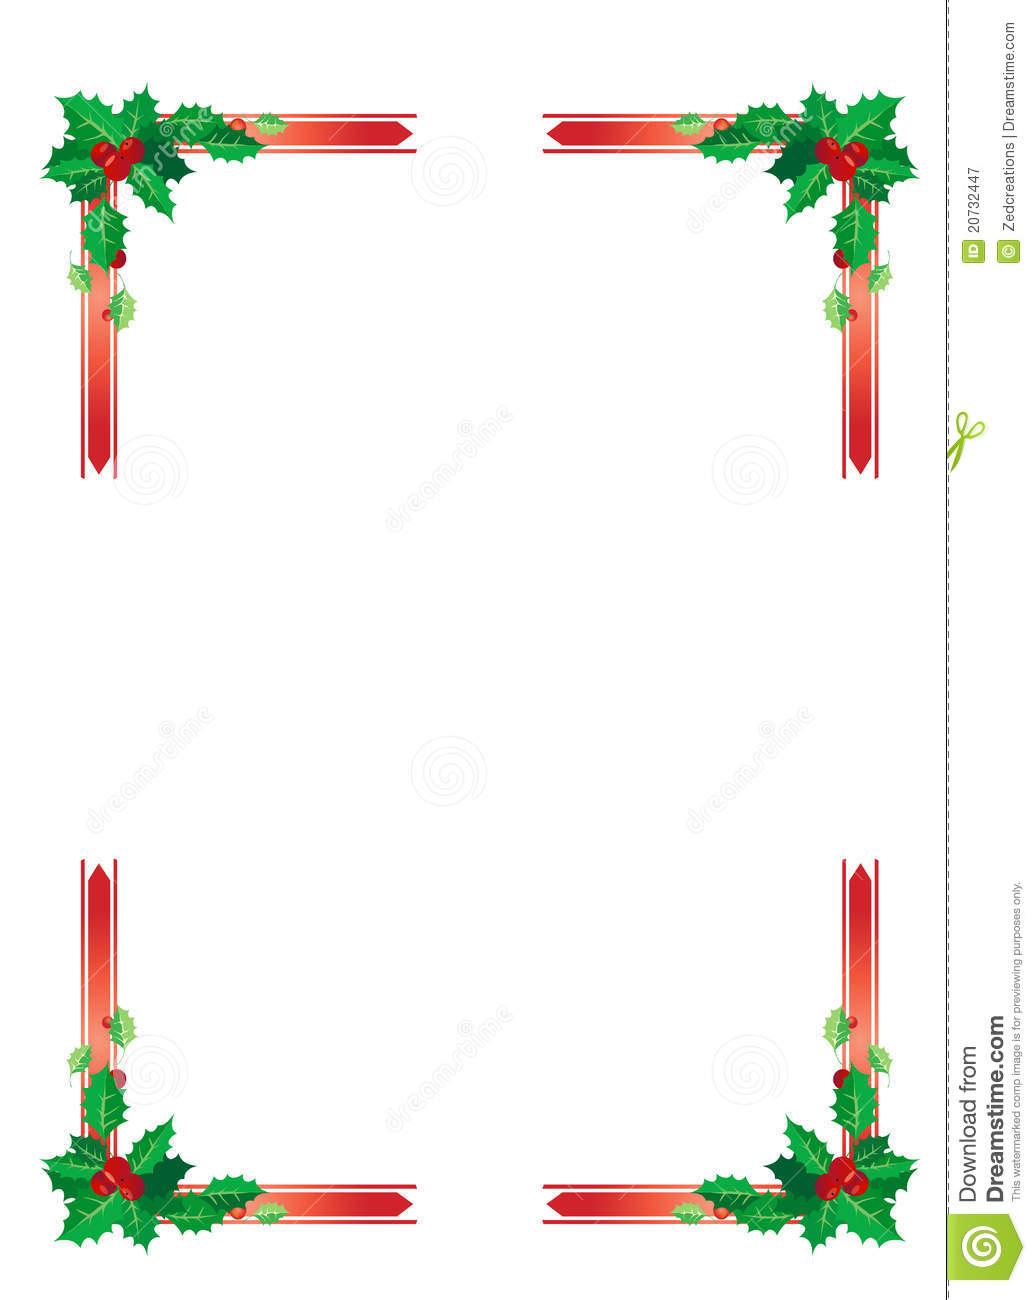 christmas design borders - photo #1